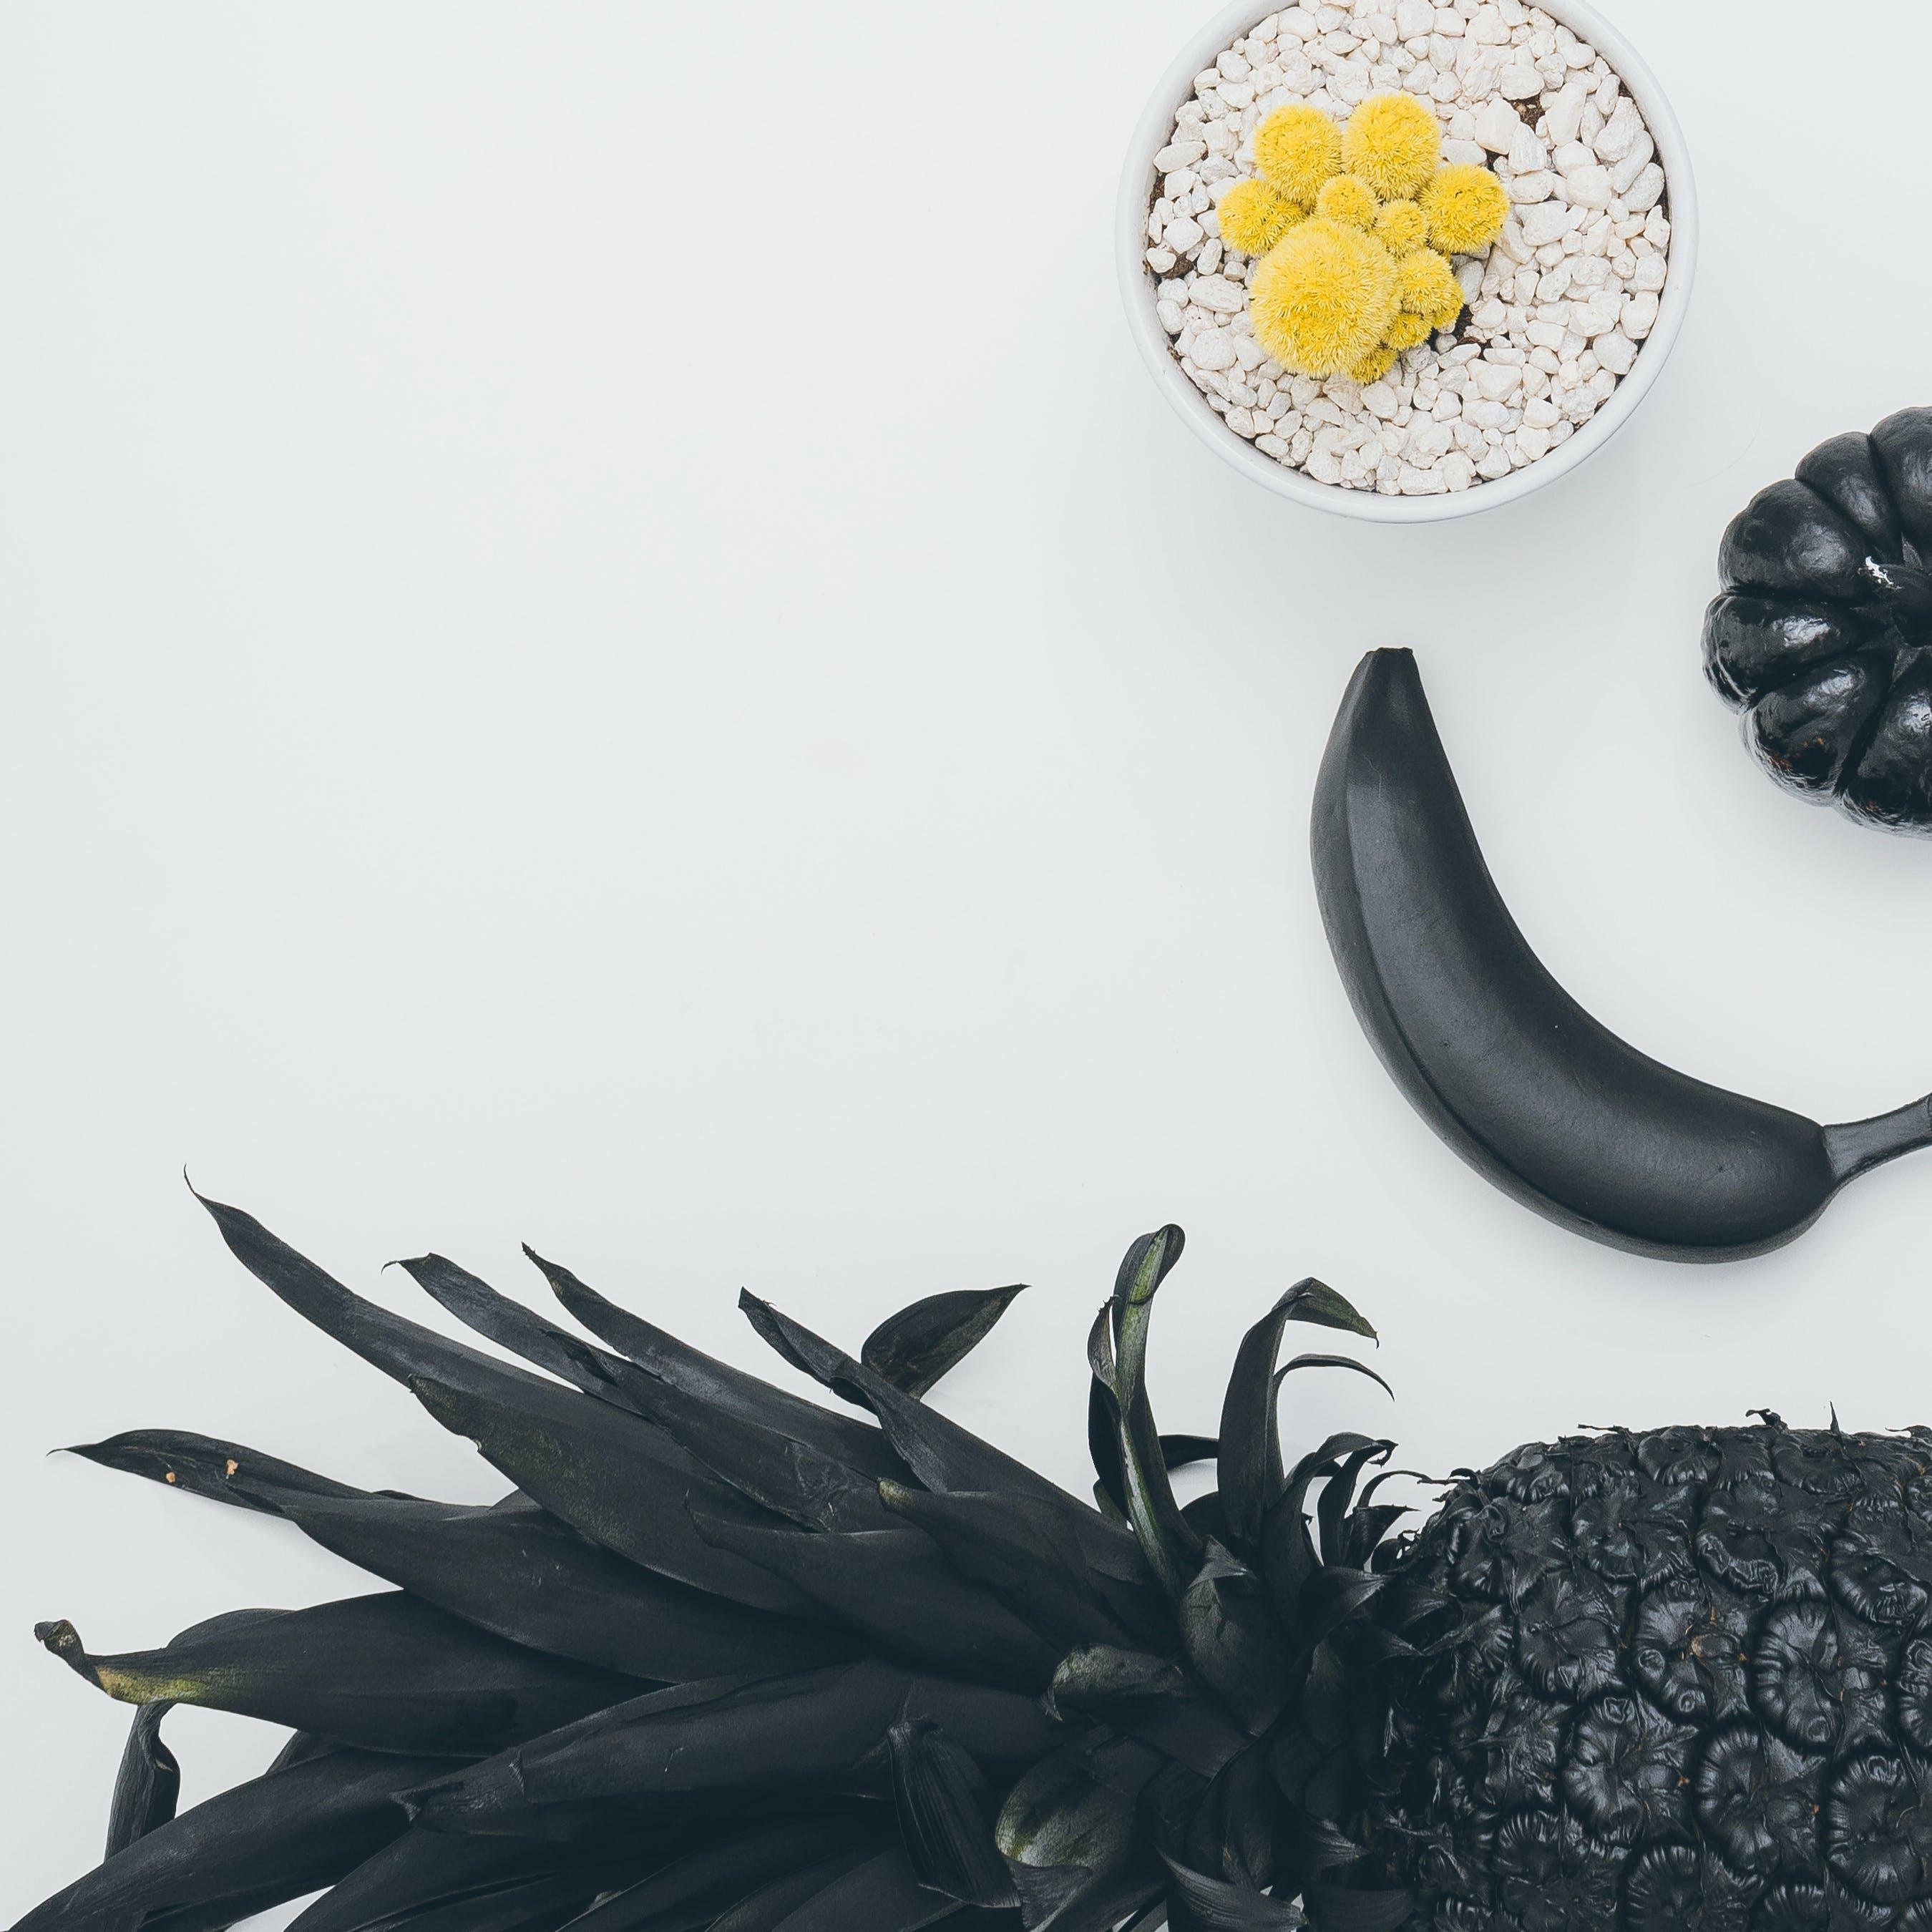 Free stock photo of art, yellow, plant, pineapple